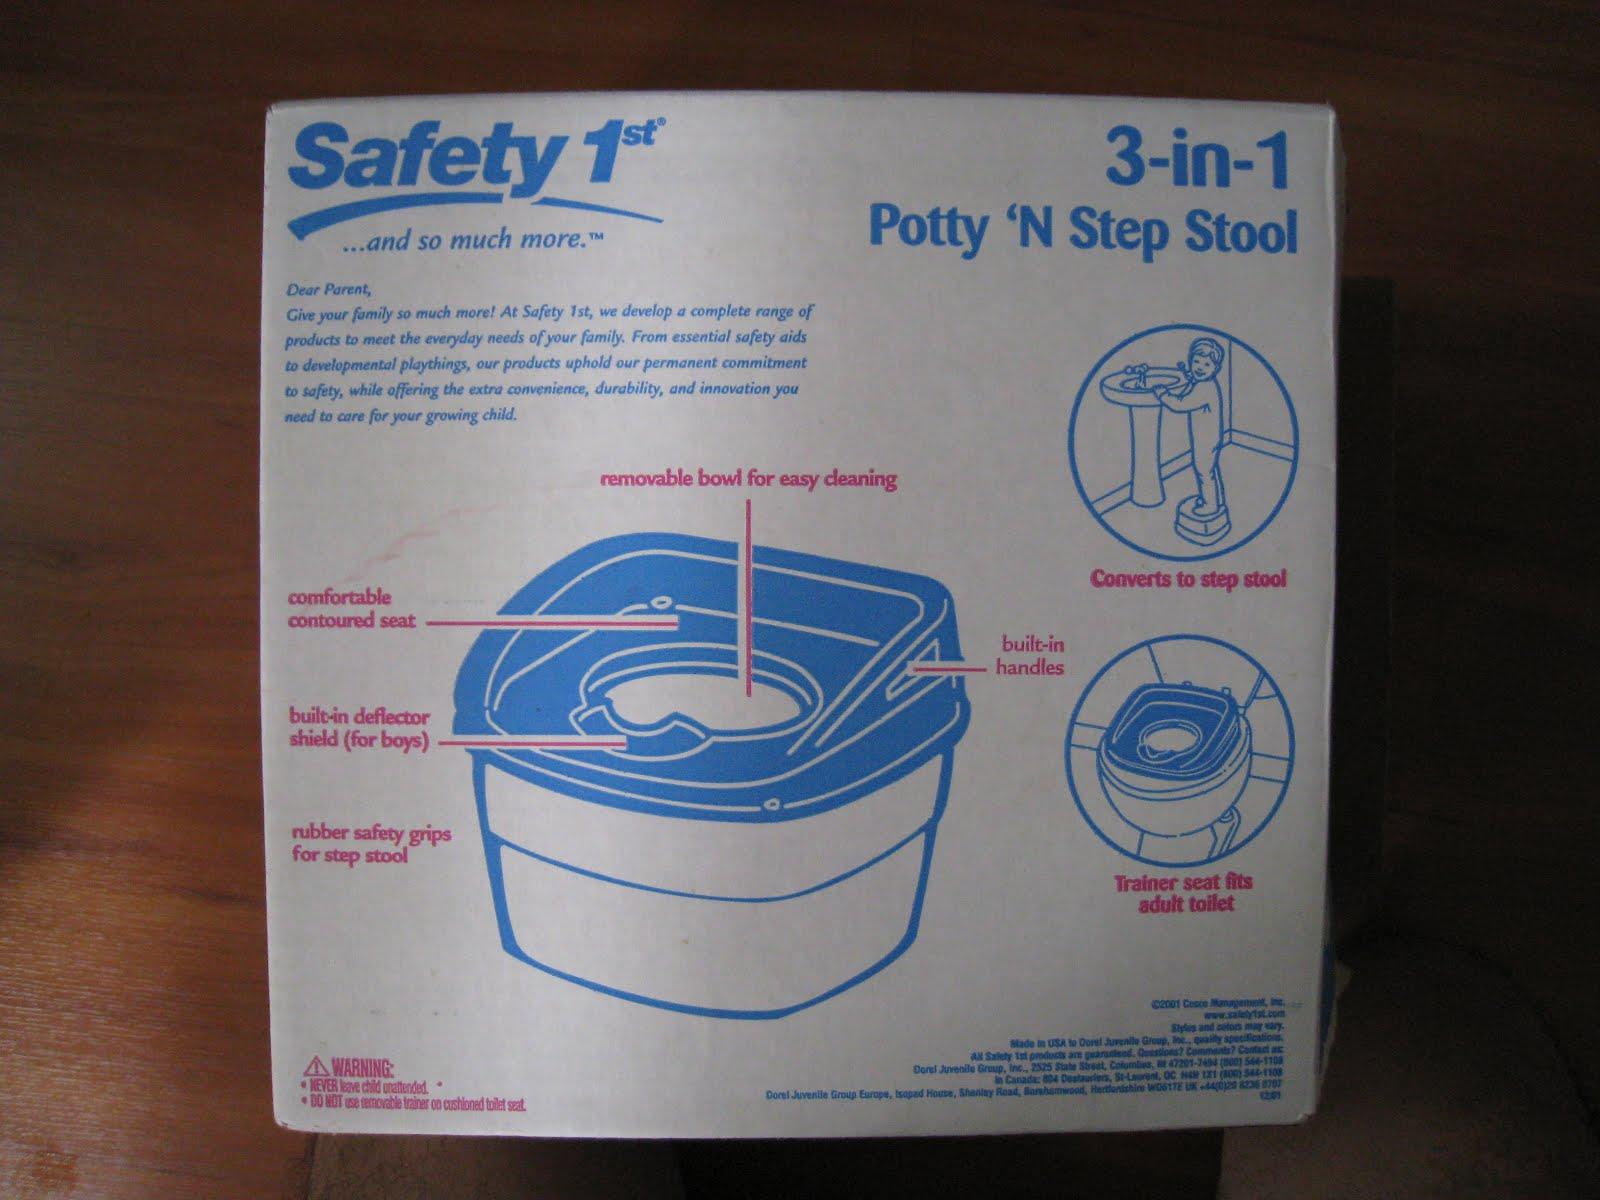 & My Zakka Shop: Used Safety 1st 3-in-1 Potty u0027N Step Stool islam-shia.org